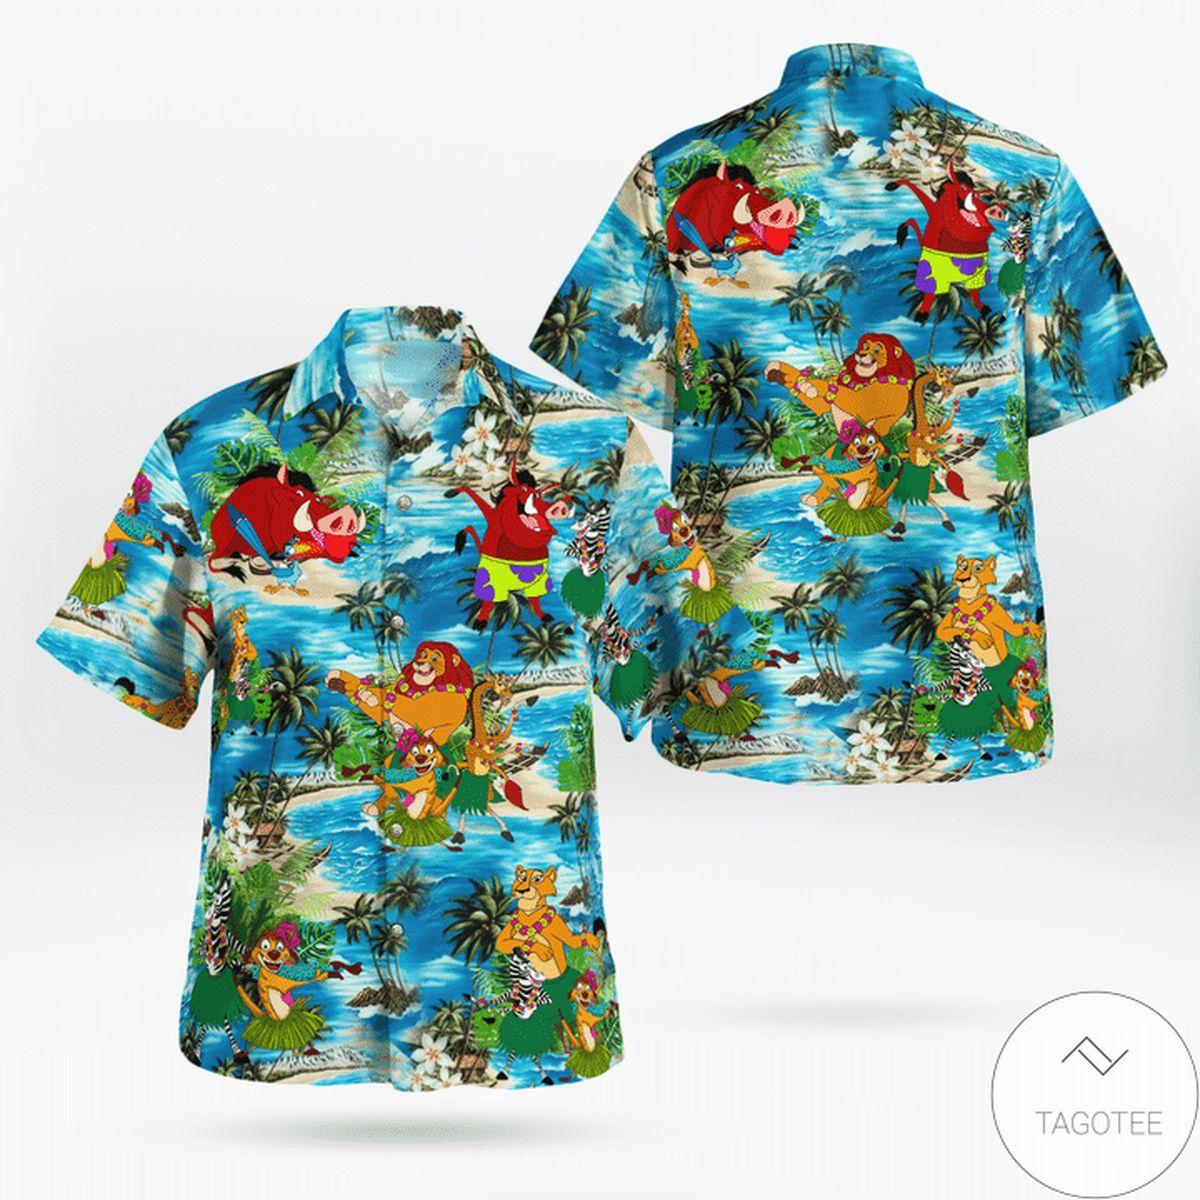 Aloha Hakuna Matata HuLa Dancing Hawaiian Shirt